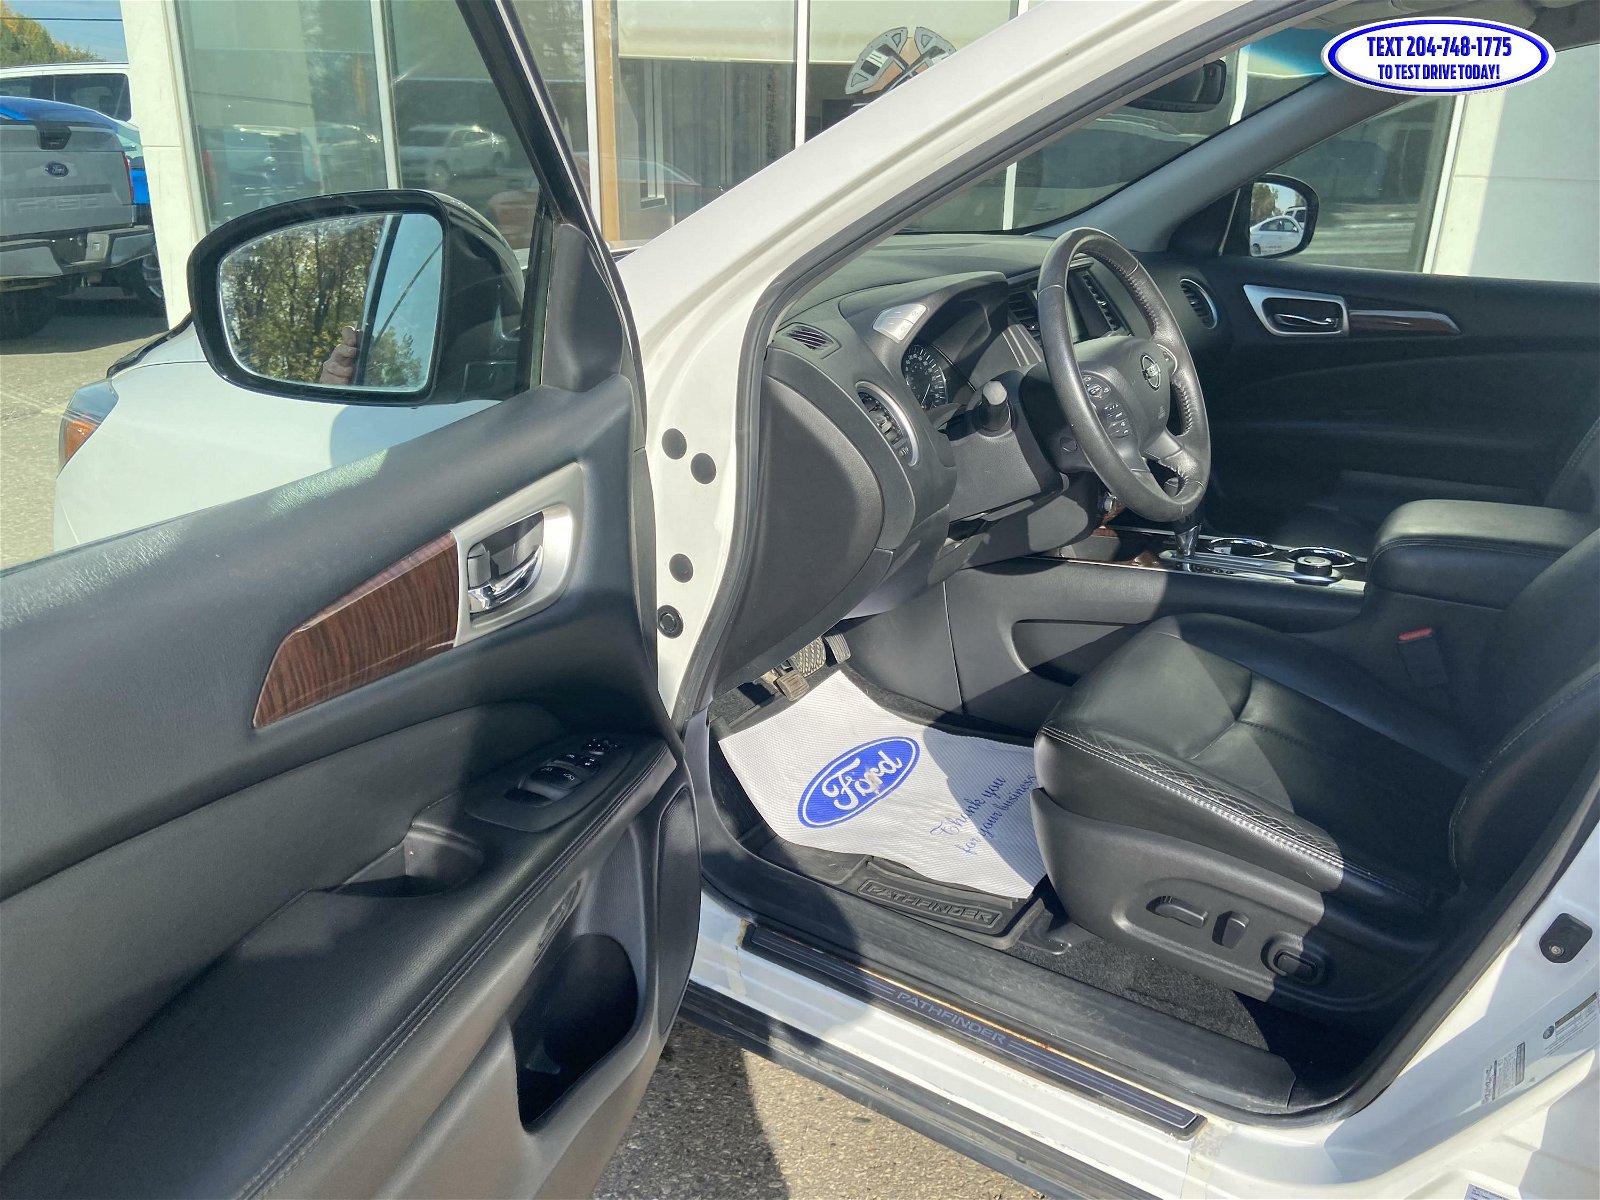 2014 Nissan Pathfinder SL AWD Loaded